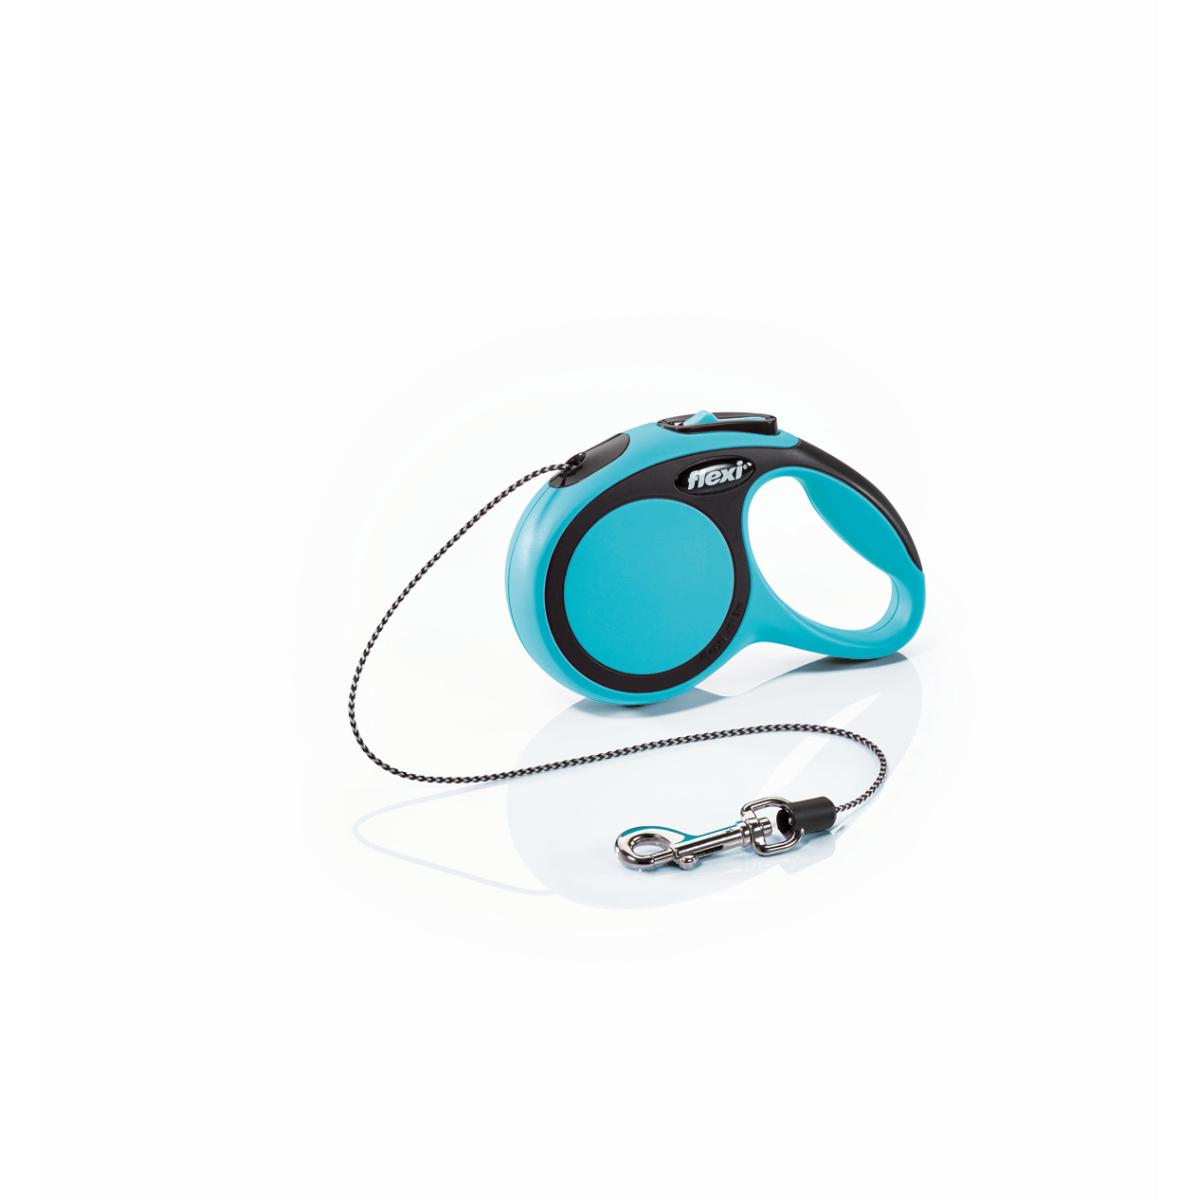 Flexi - new comfort cord xs - 3 m blauw